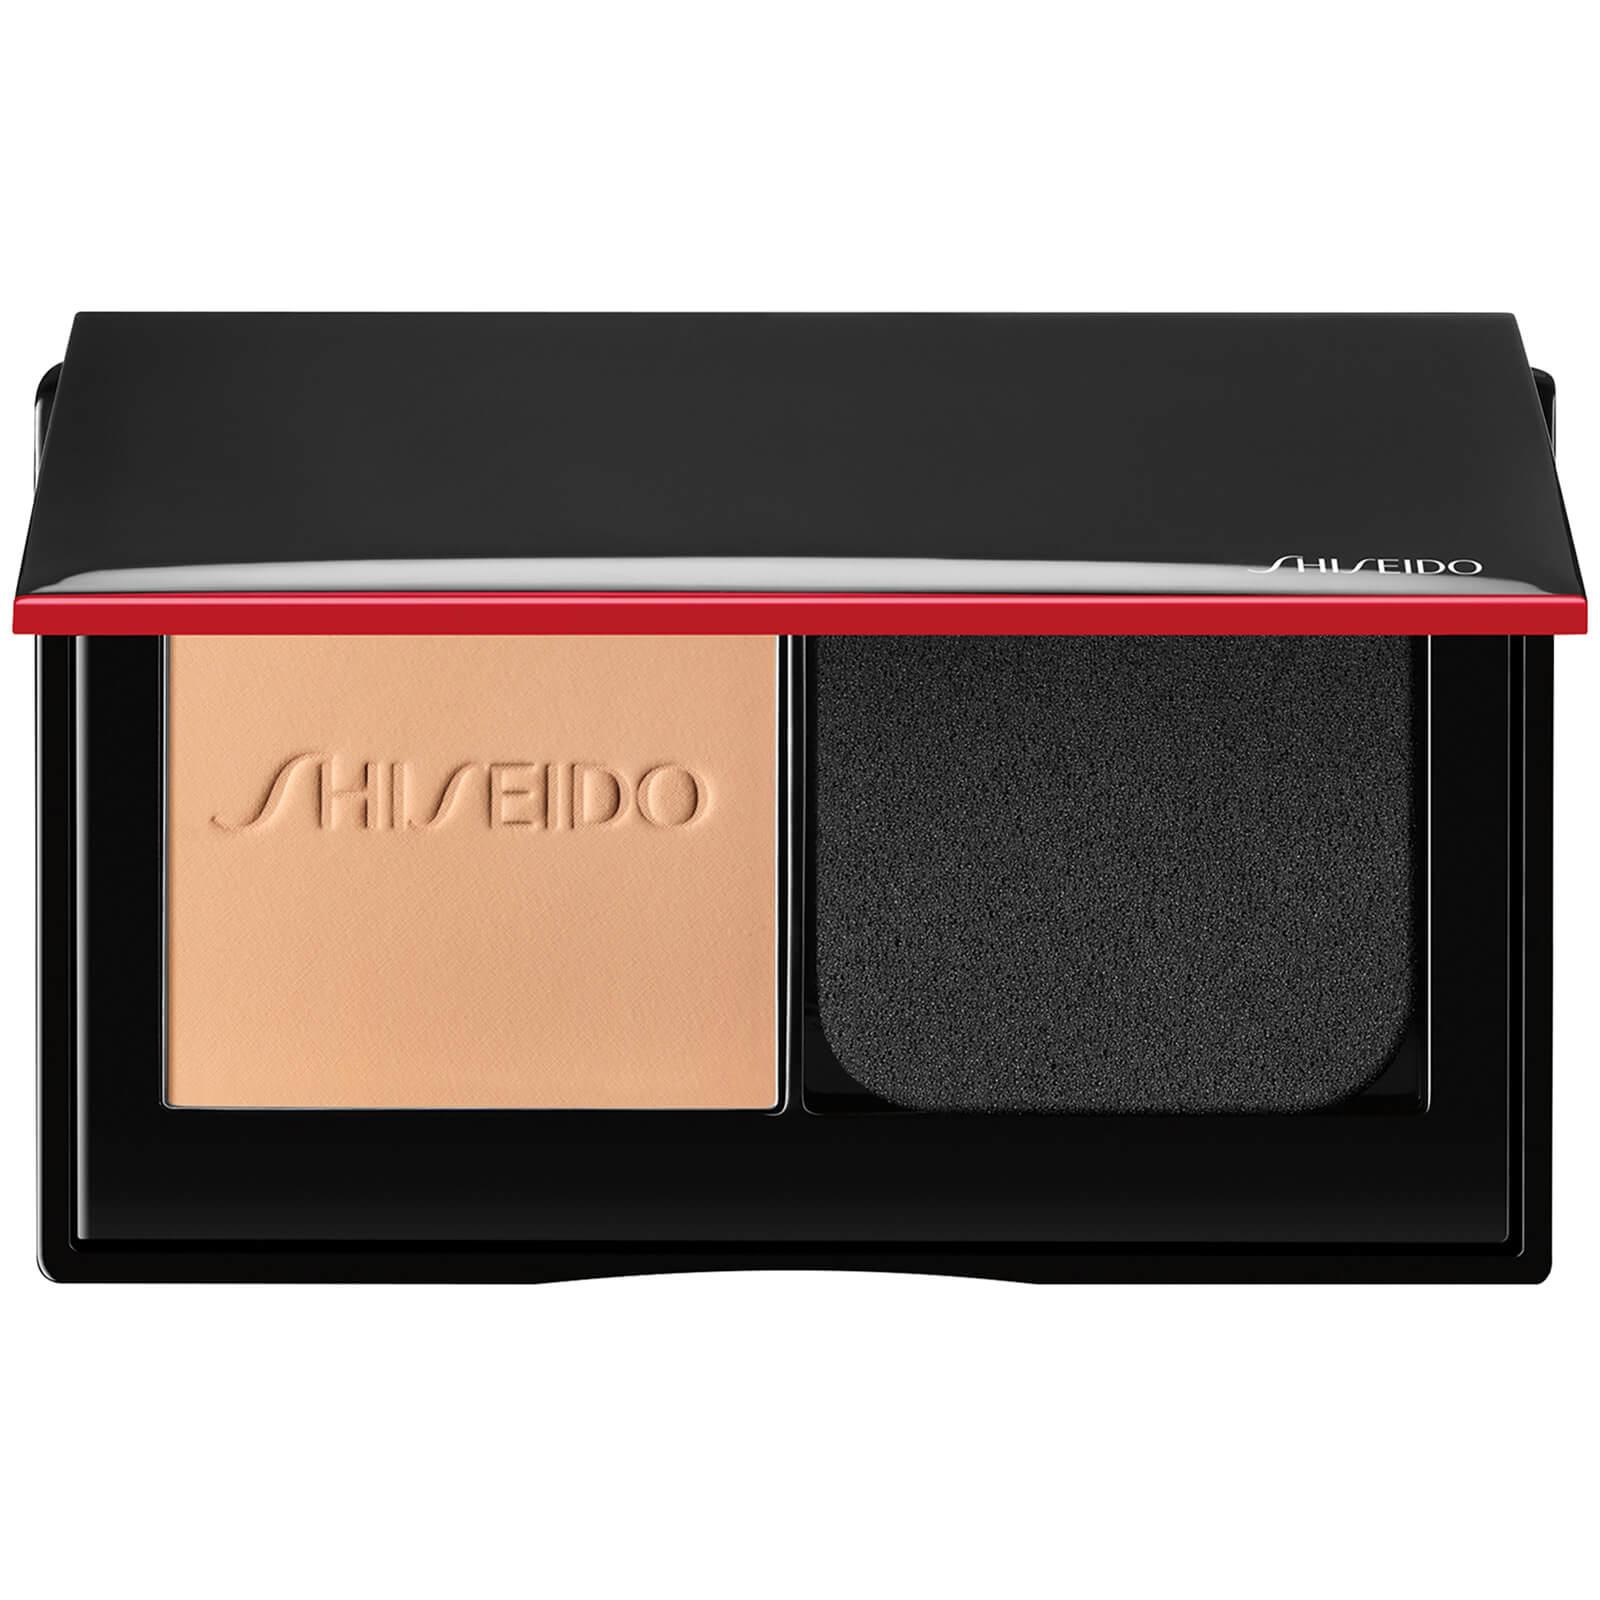 Shiseido Synchro Skin Self-Refreshing Custom Finish Powder Foundation 9g (Various Shades) - Quartz